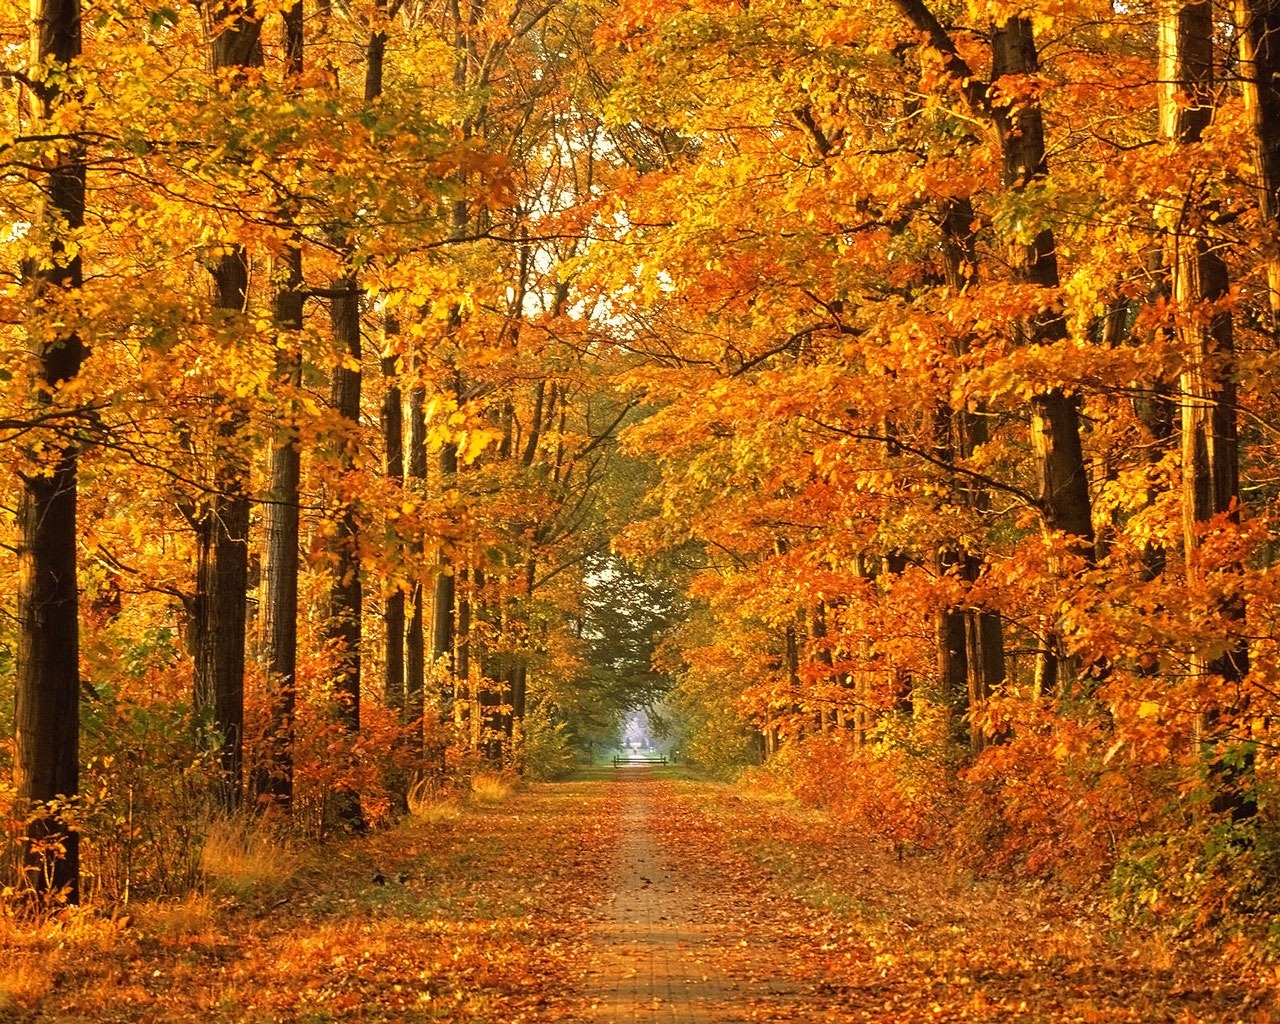 Autumn Wallpapers | Walpaper Share walpaper share